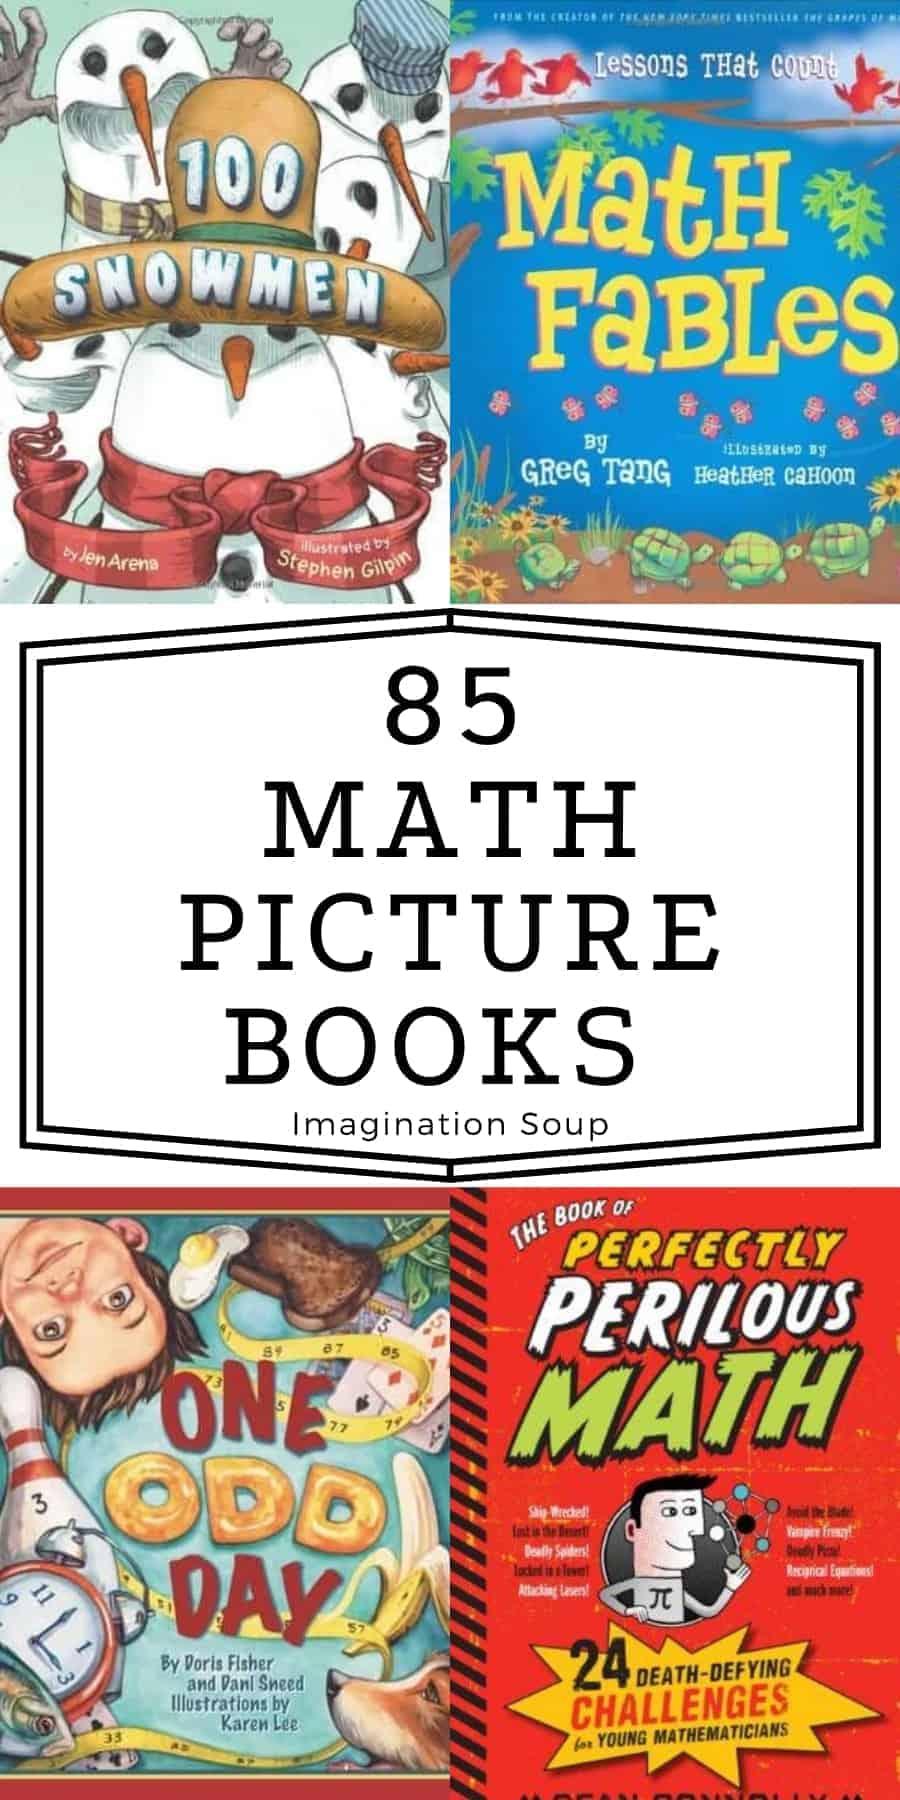 big list of math picture books